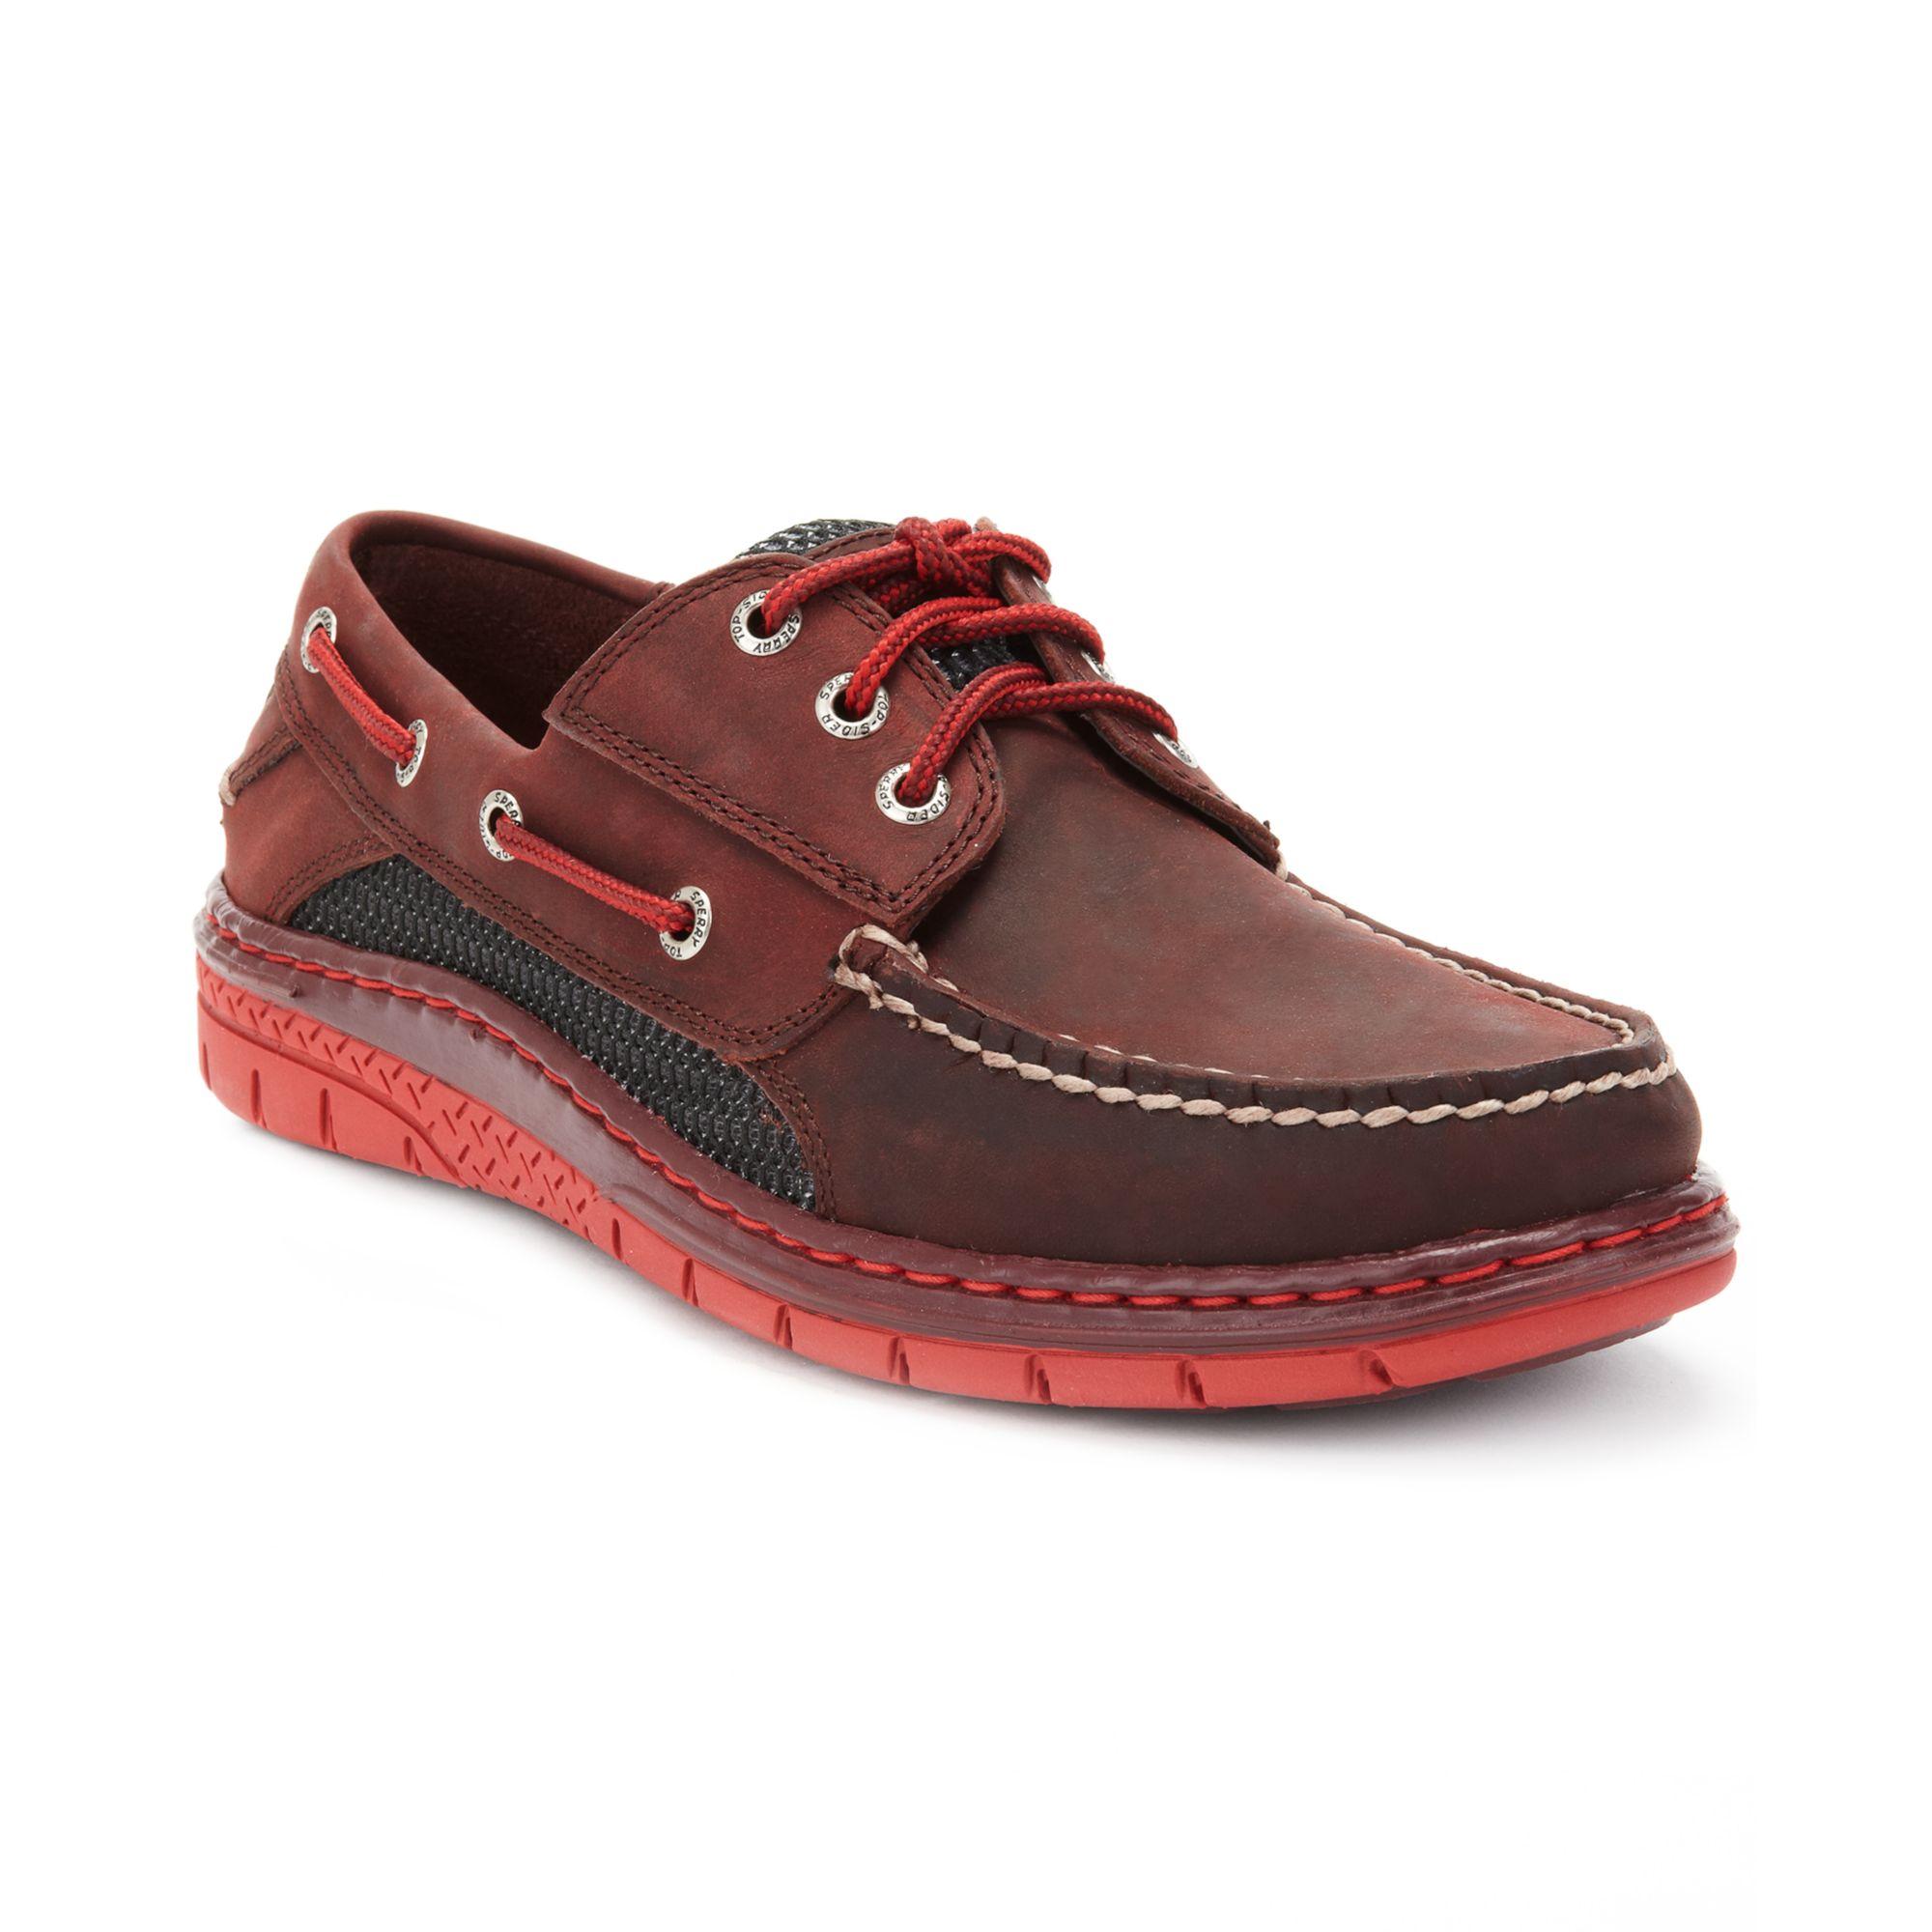 sperry top sider billfish utralite 3eye boat shoes in